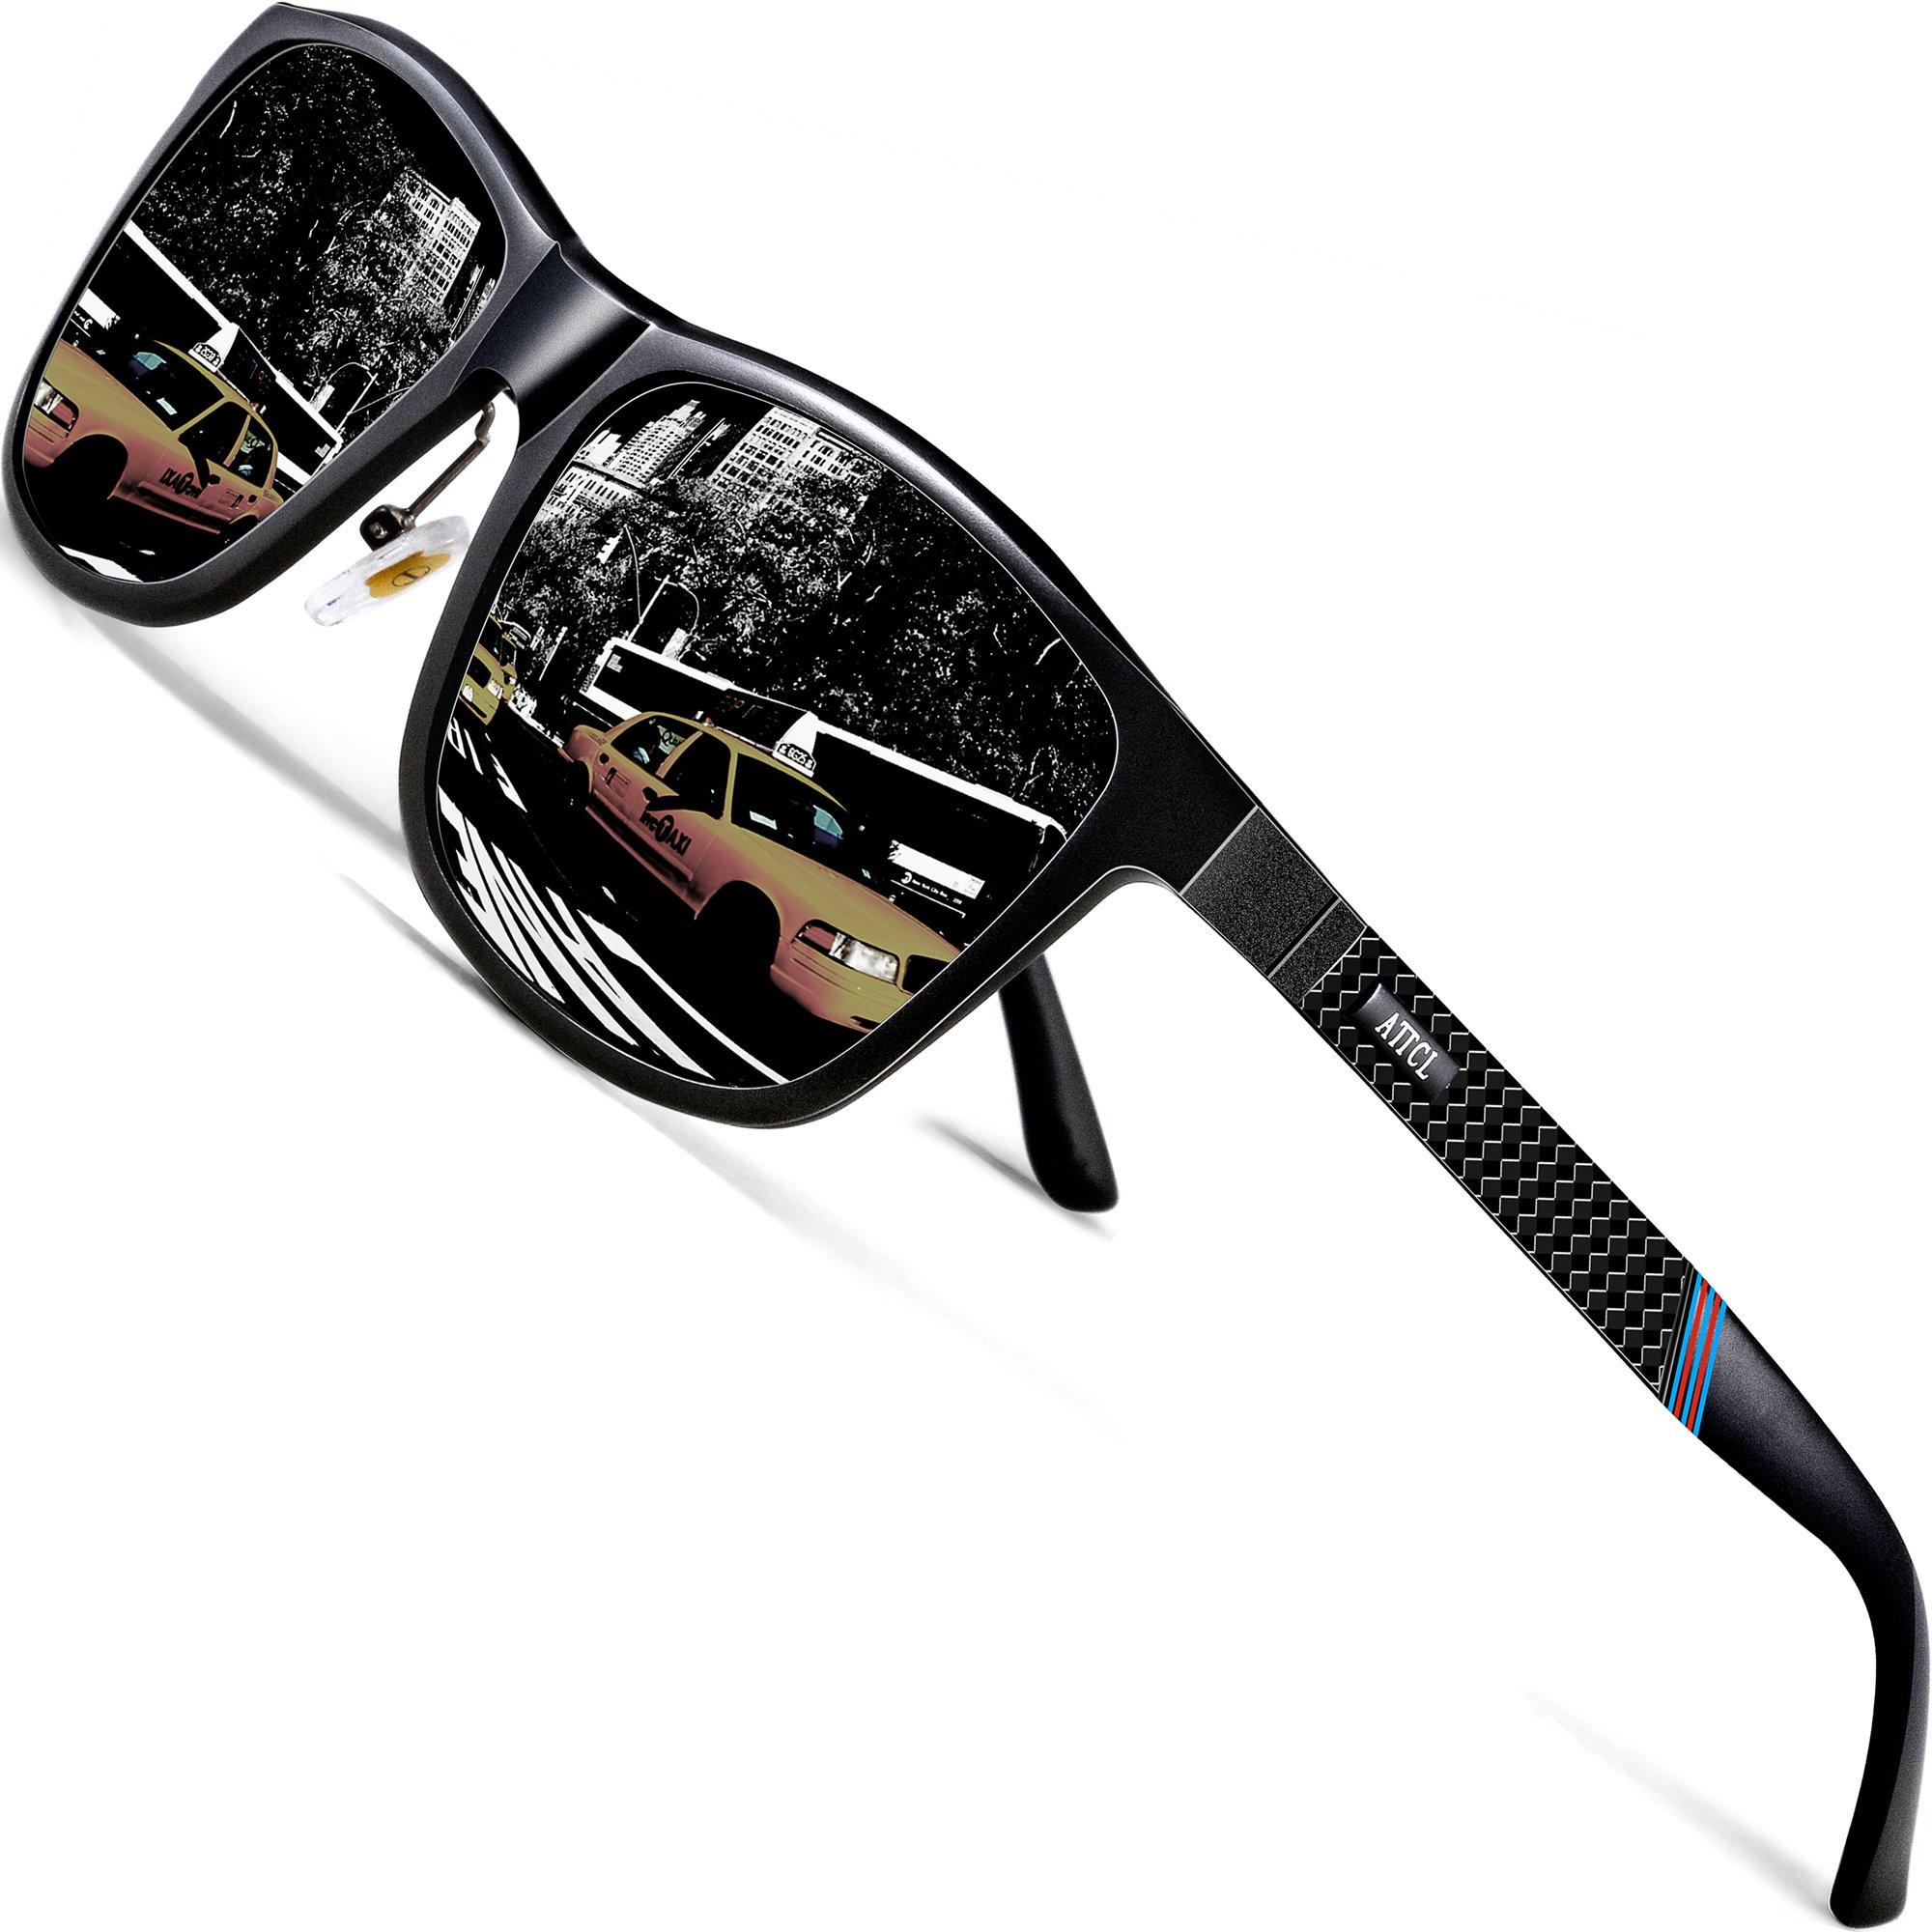 ATTCL Men's Driving Polarized Sunglasses Al-Mg Metal Frame Ultra Light 858-8 Black by ATTCL